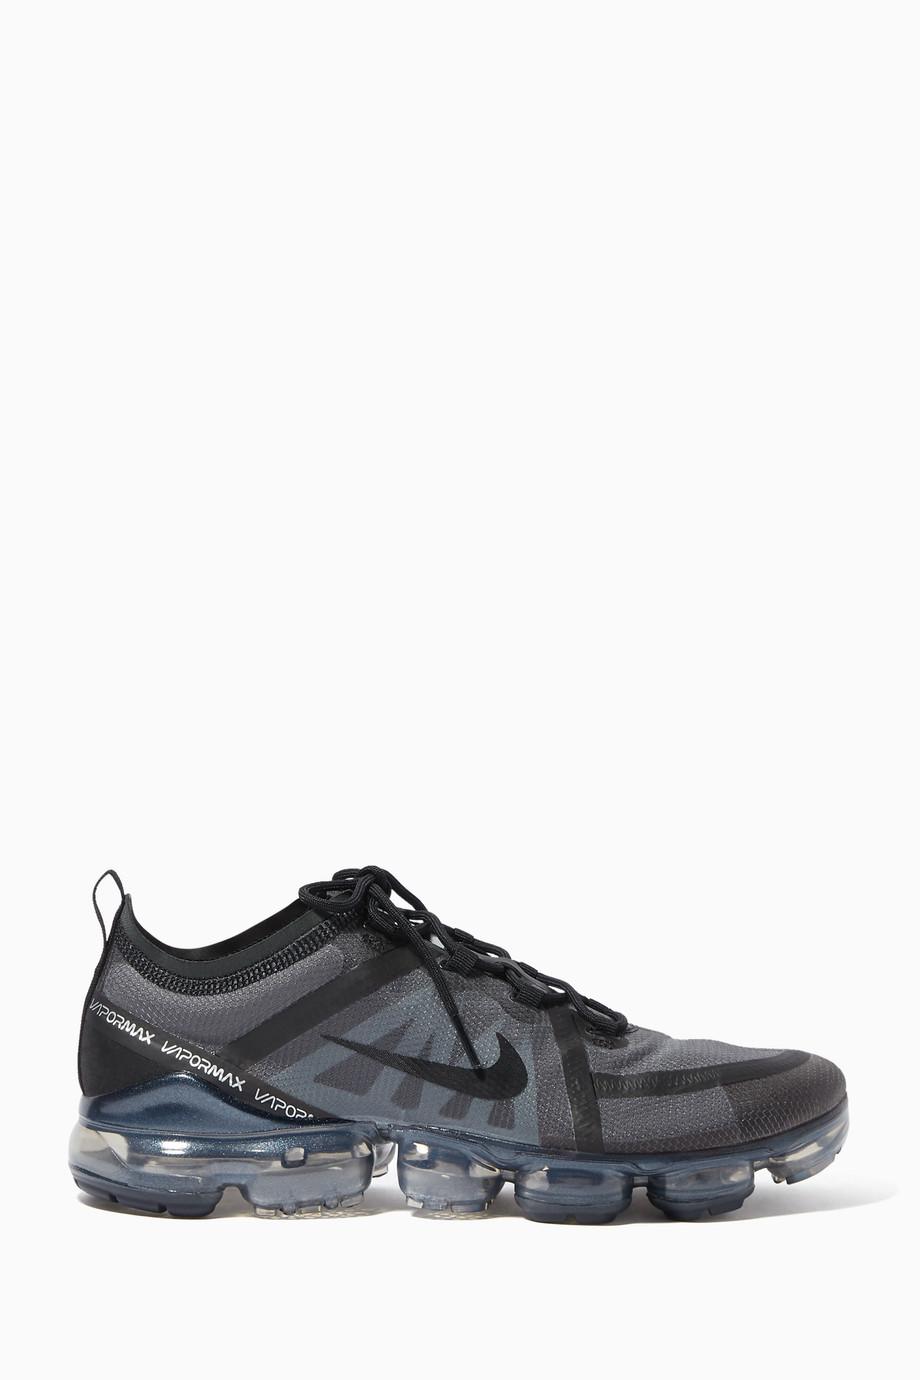 71090d666 تسوق حذاء سنيكرز آير فابور ماكس 2019 Nike أسود للرجال   اُناس